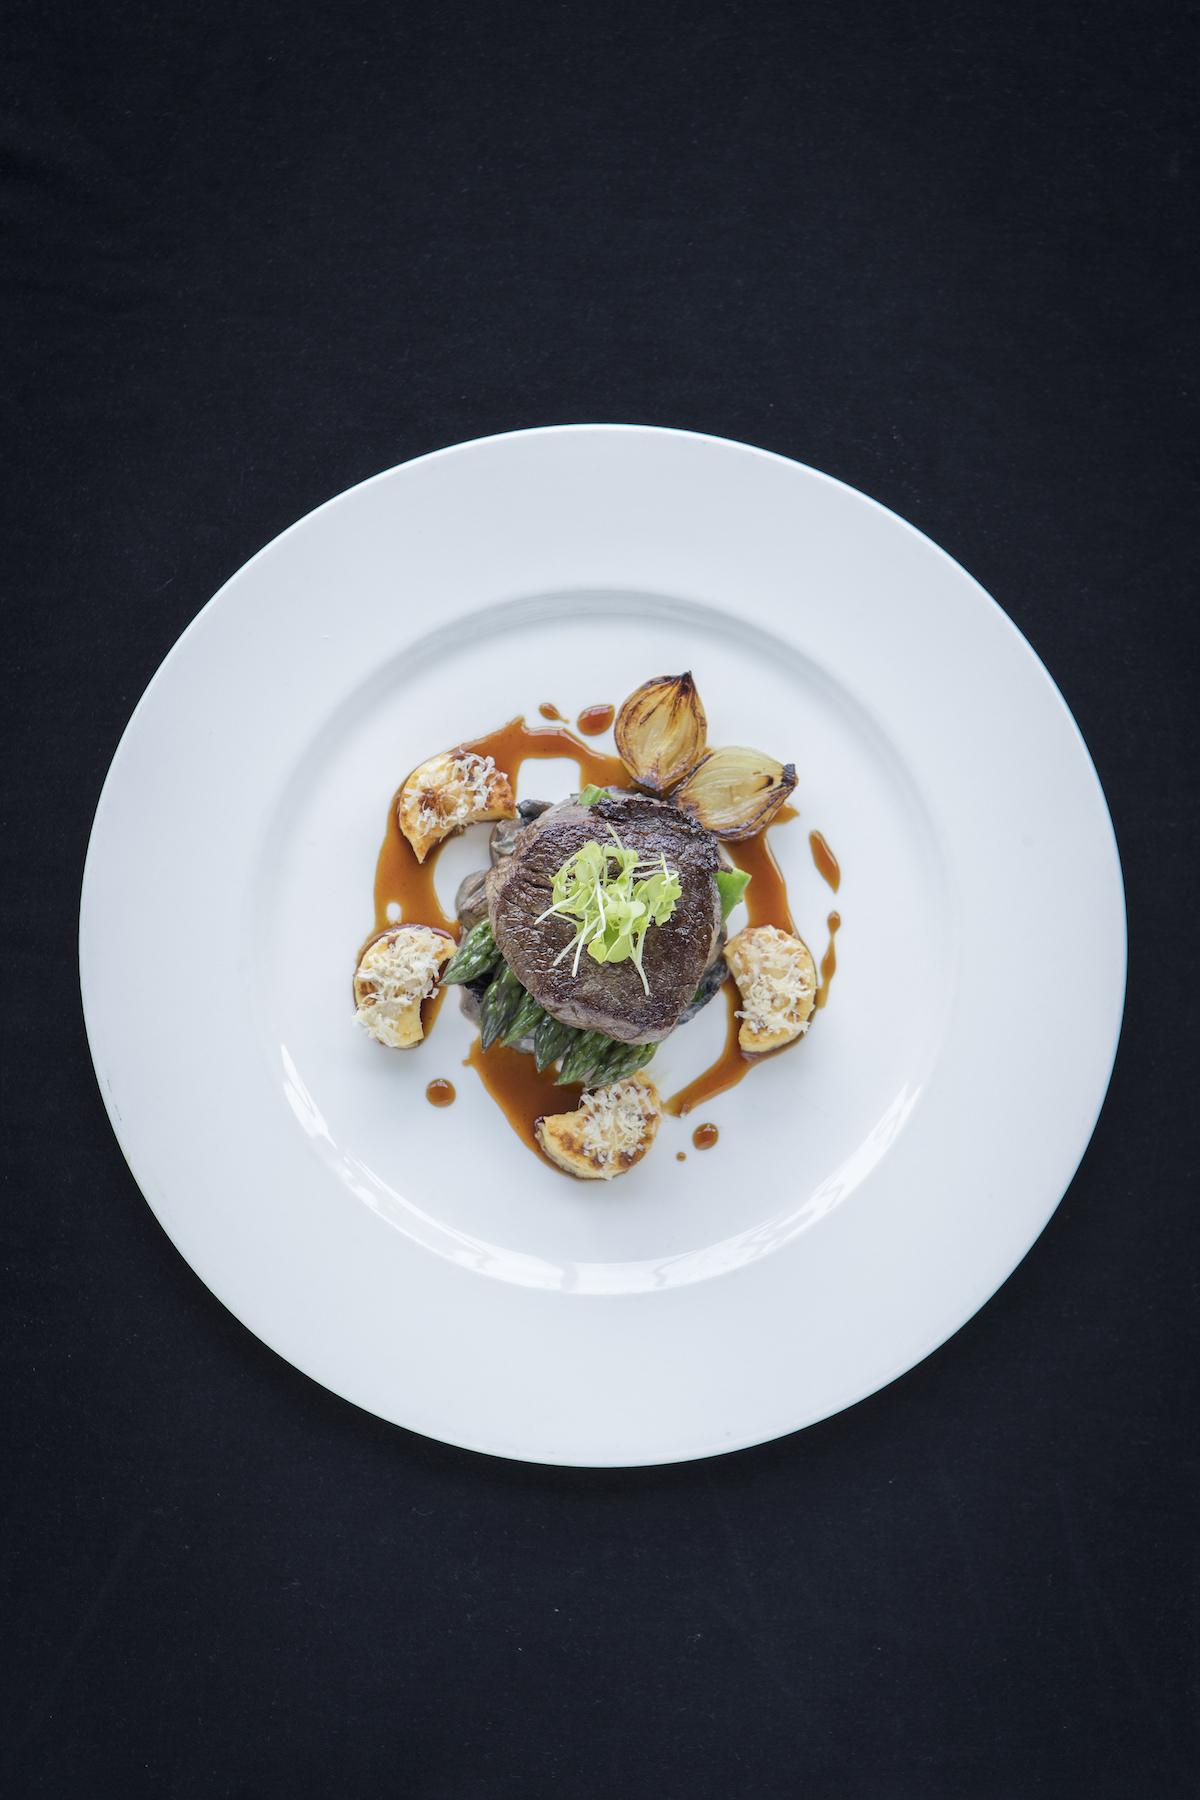 Chameleon Restaurant at the Intercontinental Wellington dish: Silver Fern Farms beef tenderloin, mushroom ragout, roast Parmesan gnocchi, button onion and asparagus.